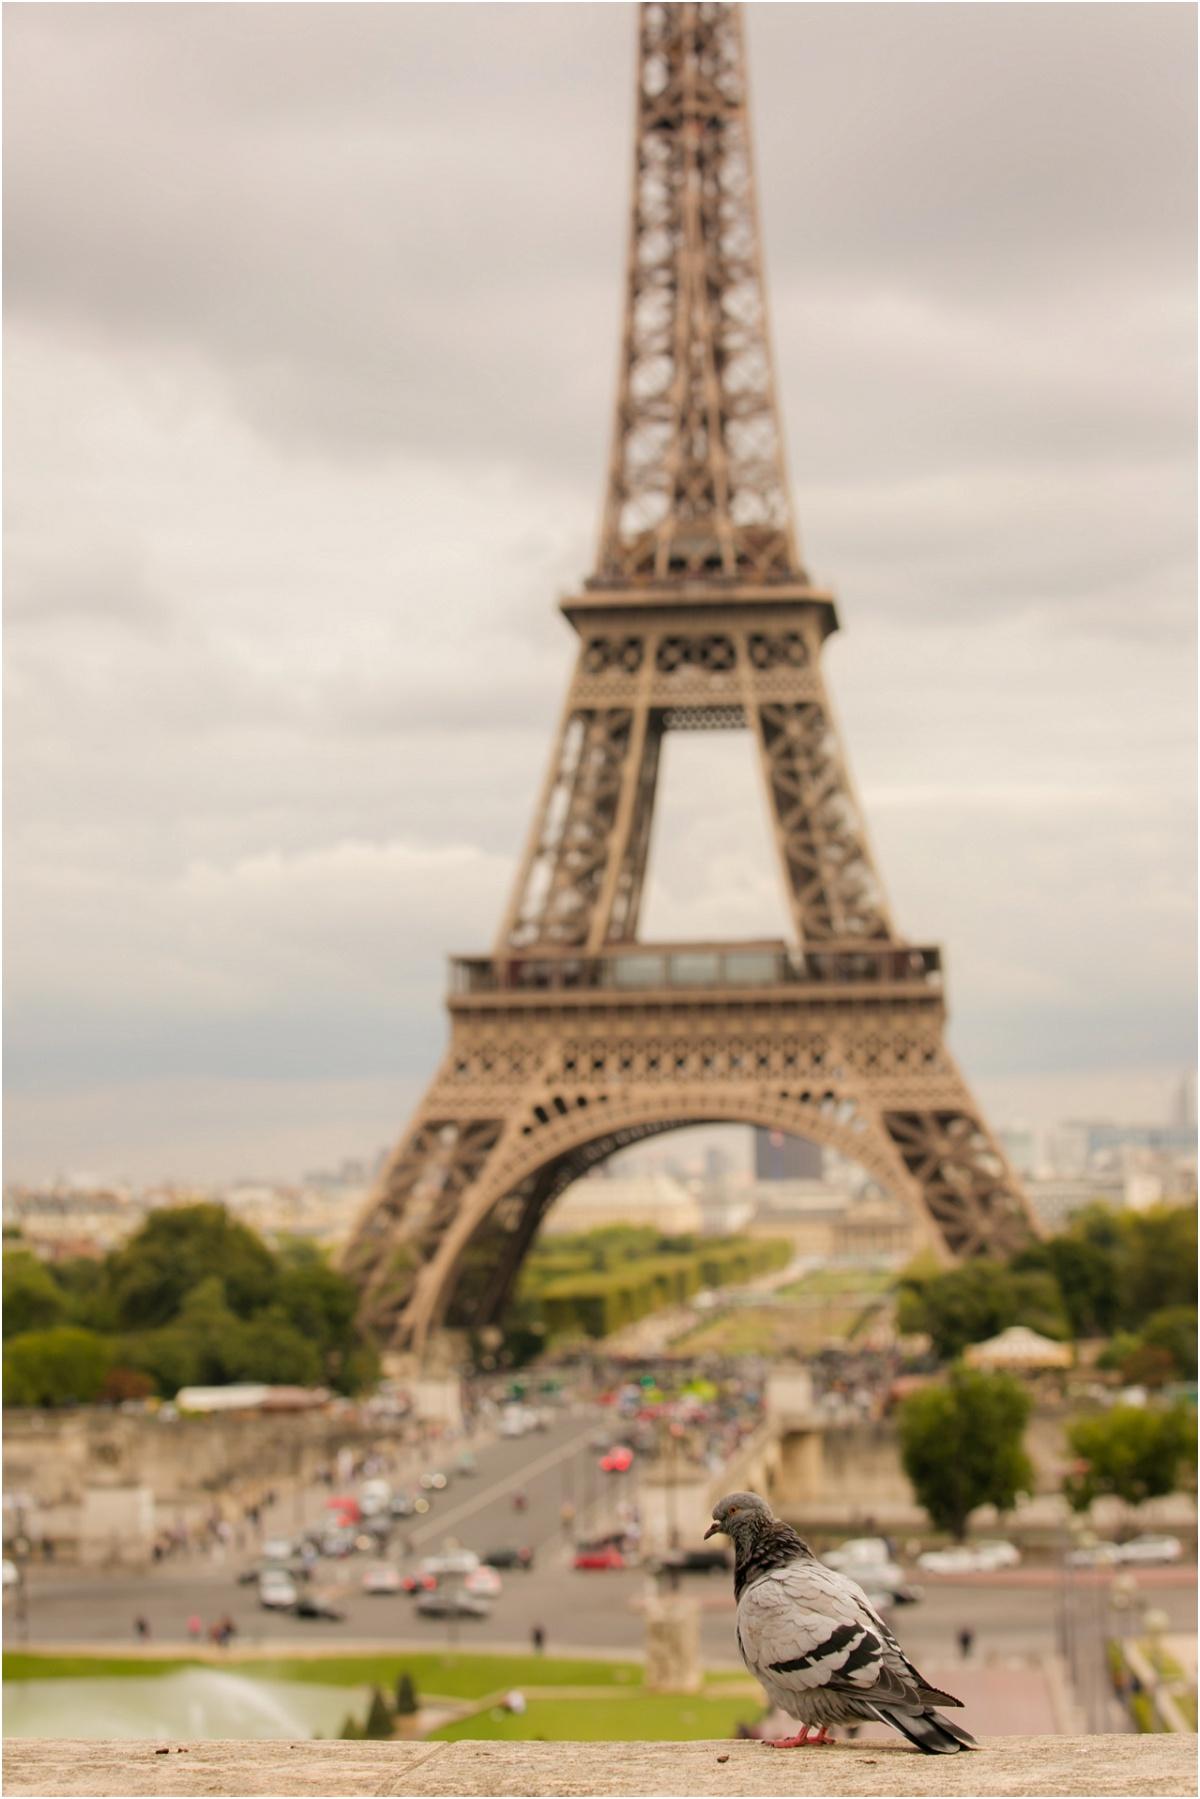 Tour Eiffel Terra Cooper Photography_4253.jpg